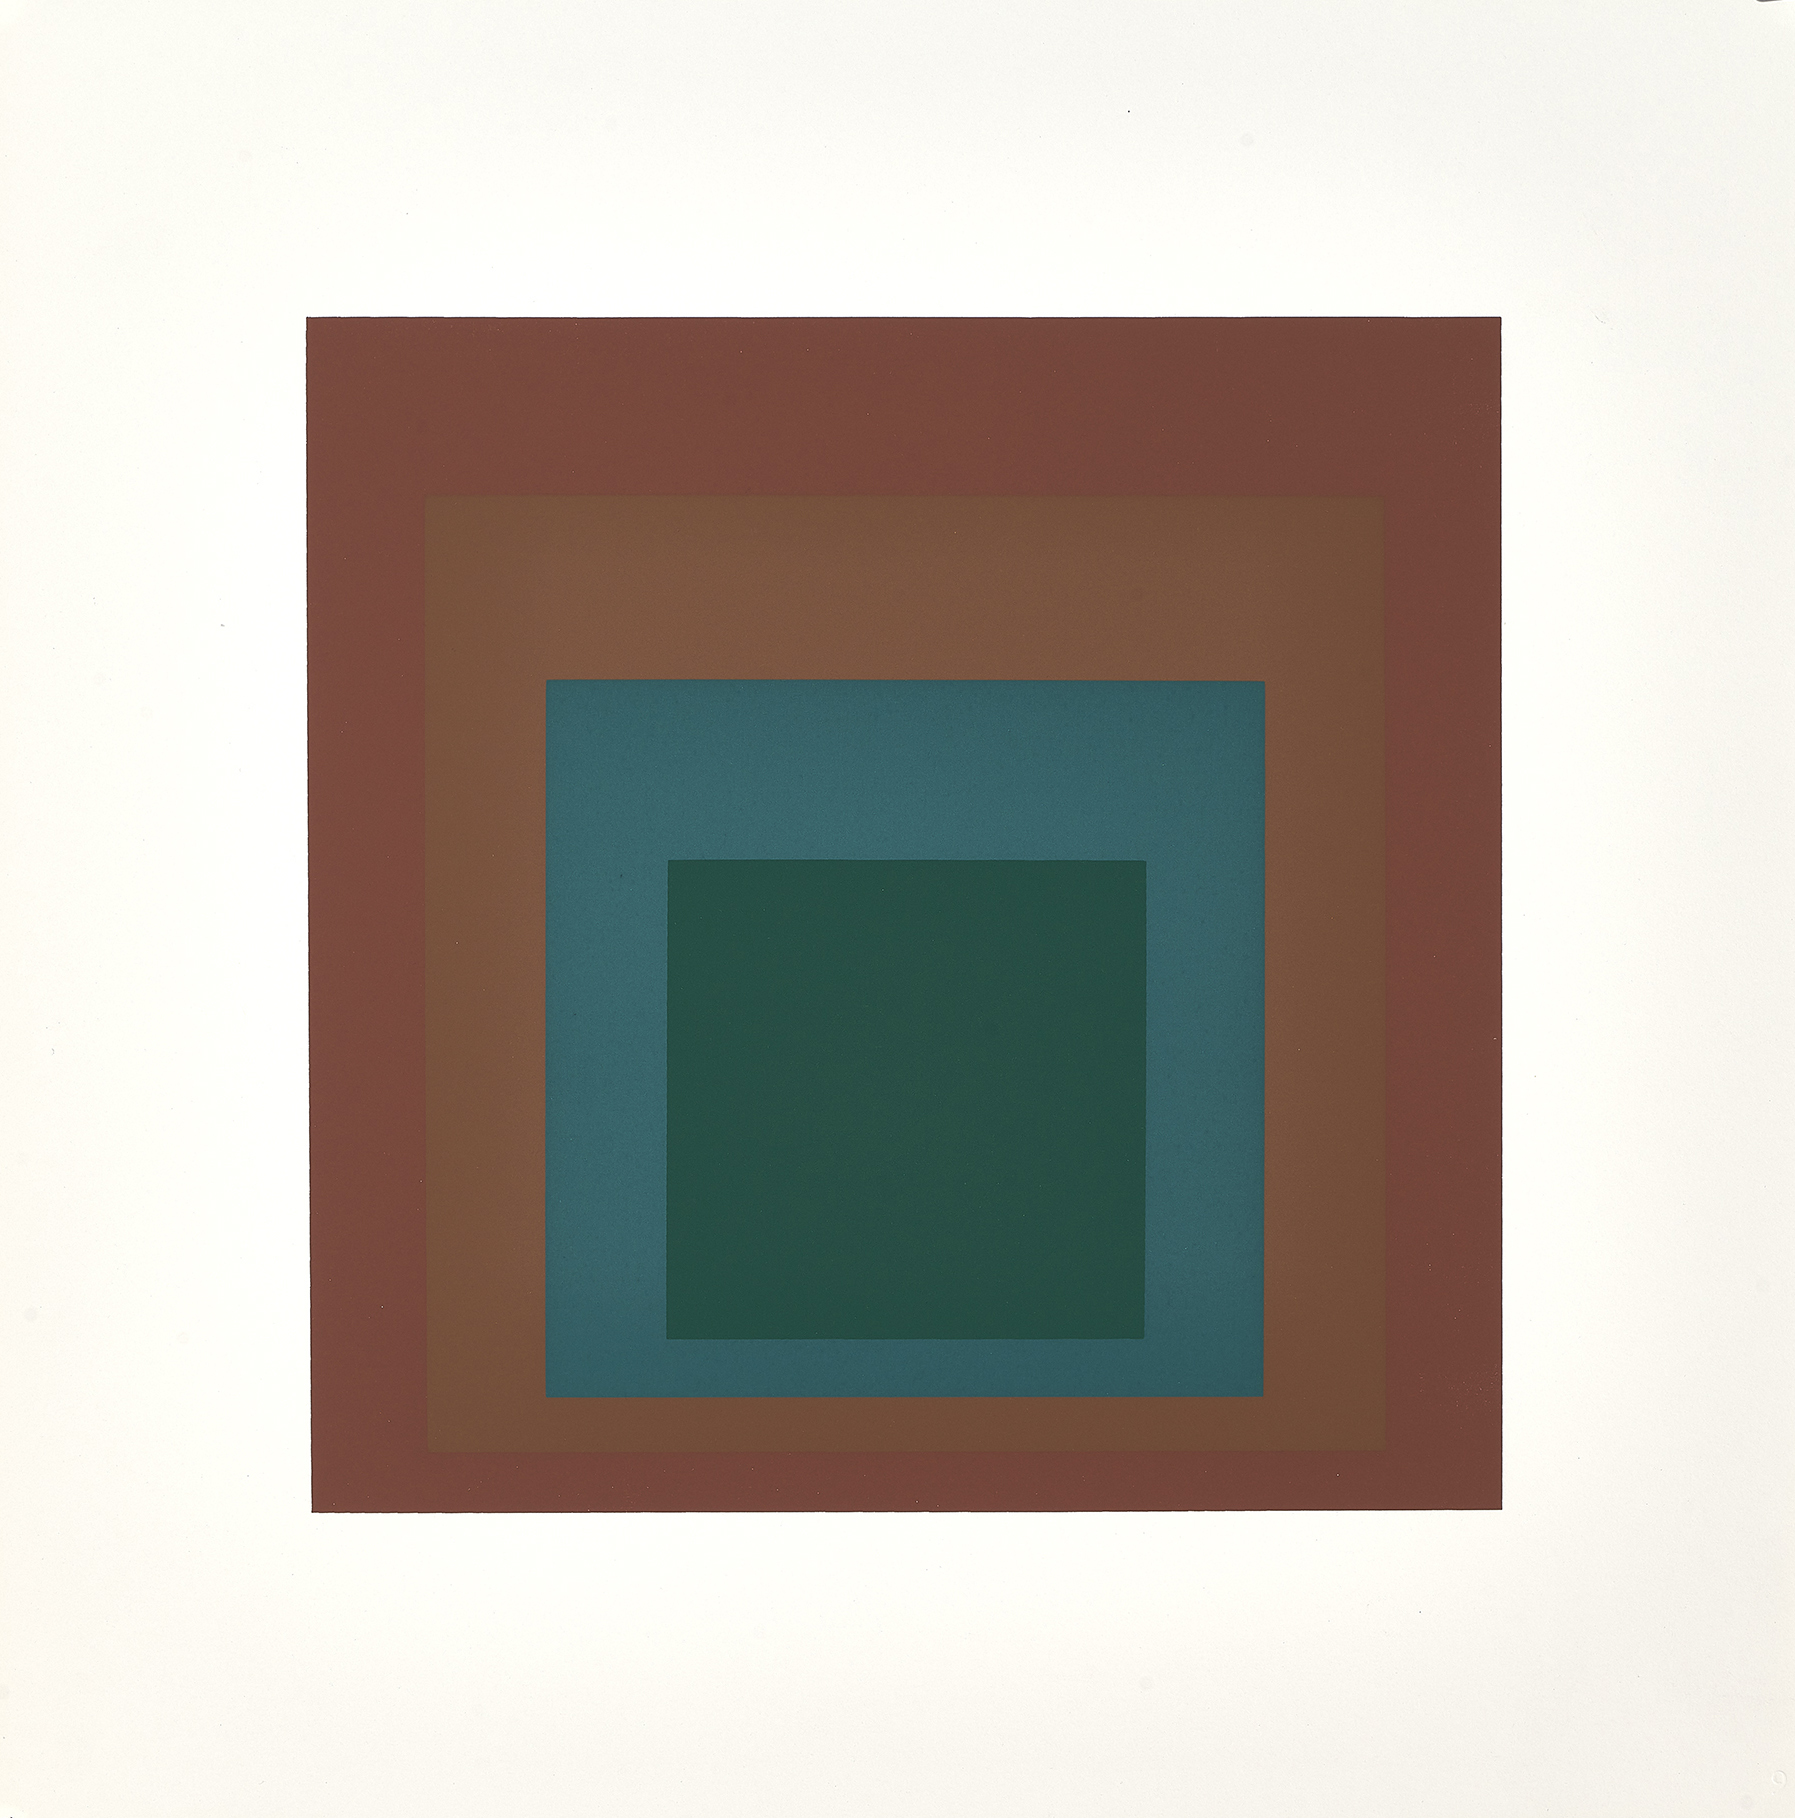 Albers Josef, Portfolio. Homage to the Square: Ten Works by Josef Albers